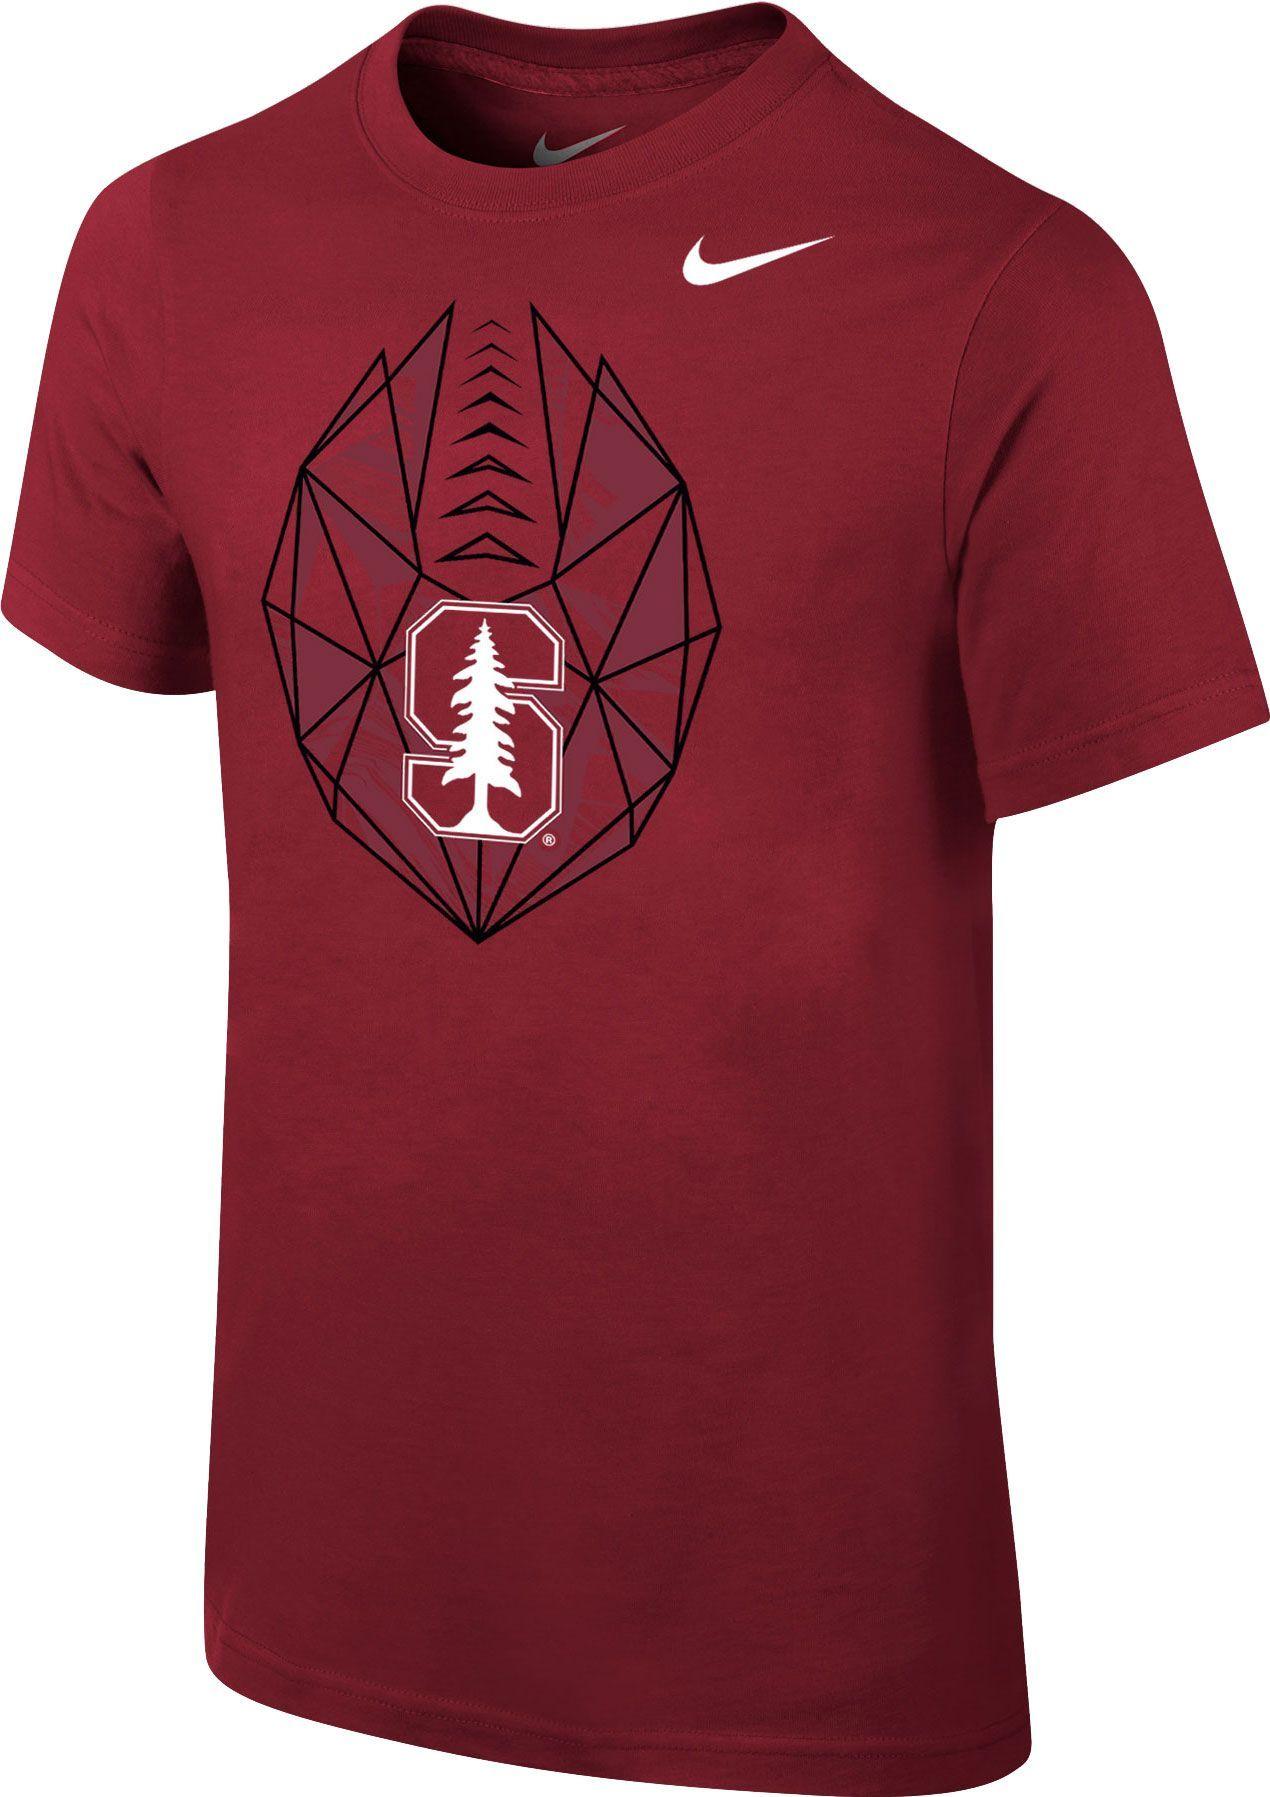 aa4859b587 Nike Youth Stanford Cardinal Cardinal Football Icon T-Shirt, Red ...